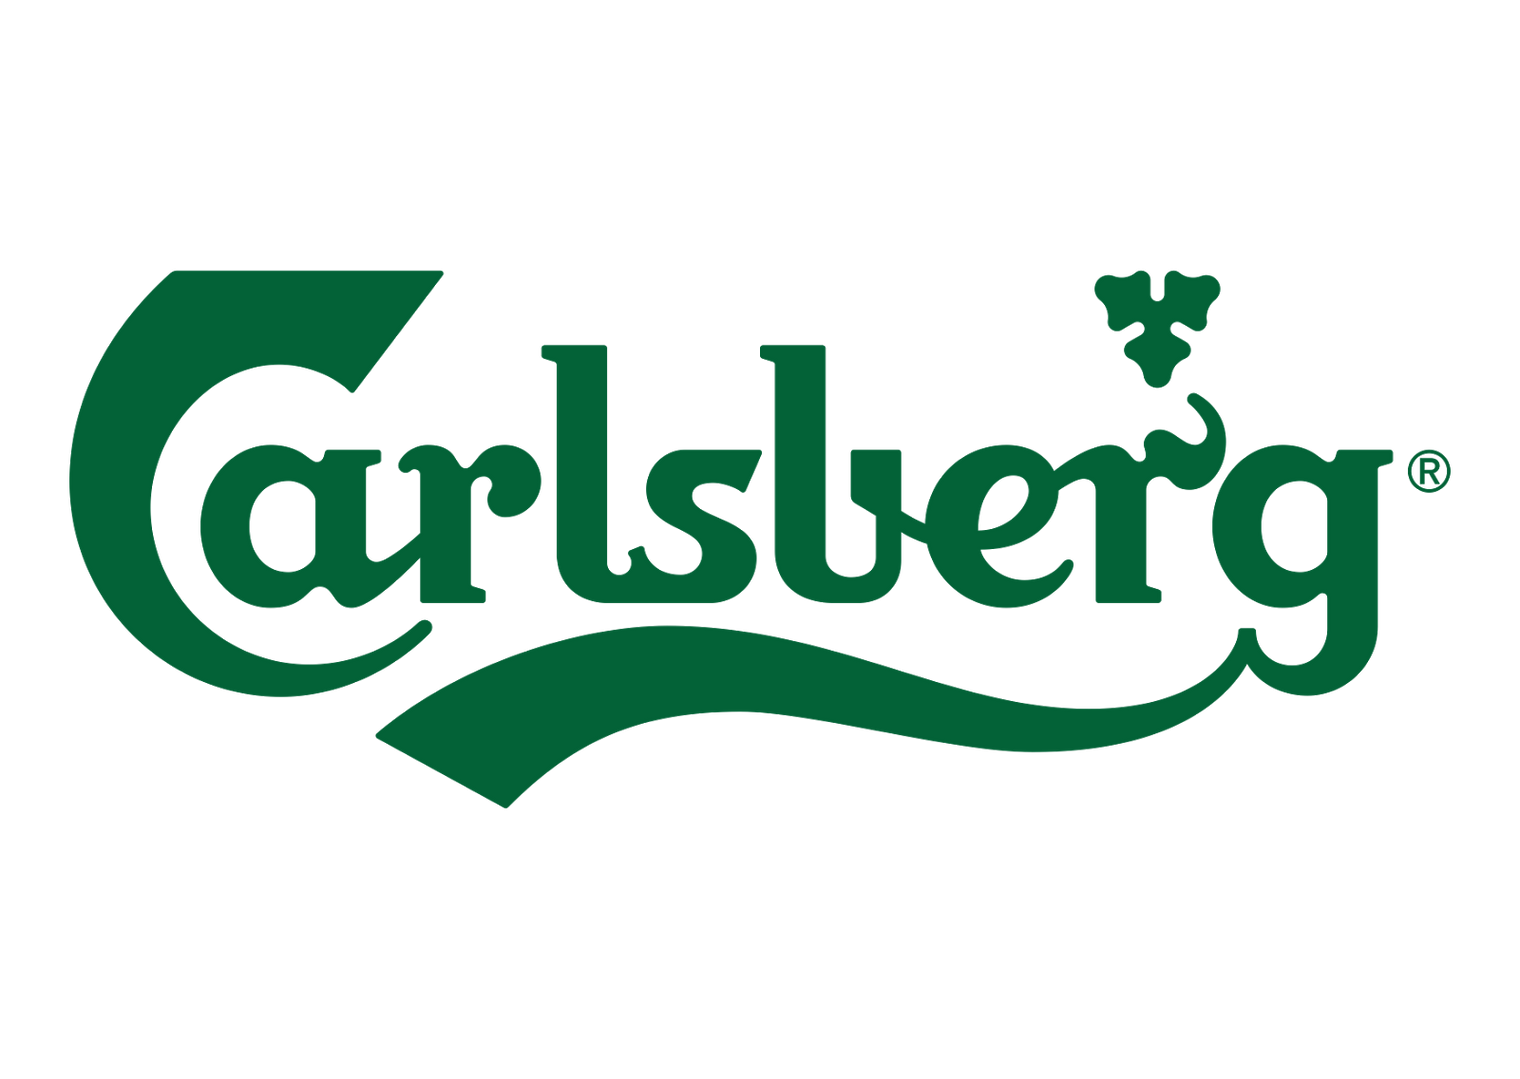 Carlsberg-logo-vector.png